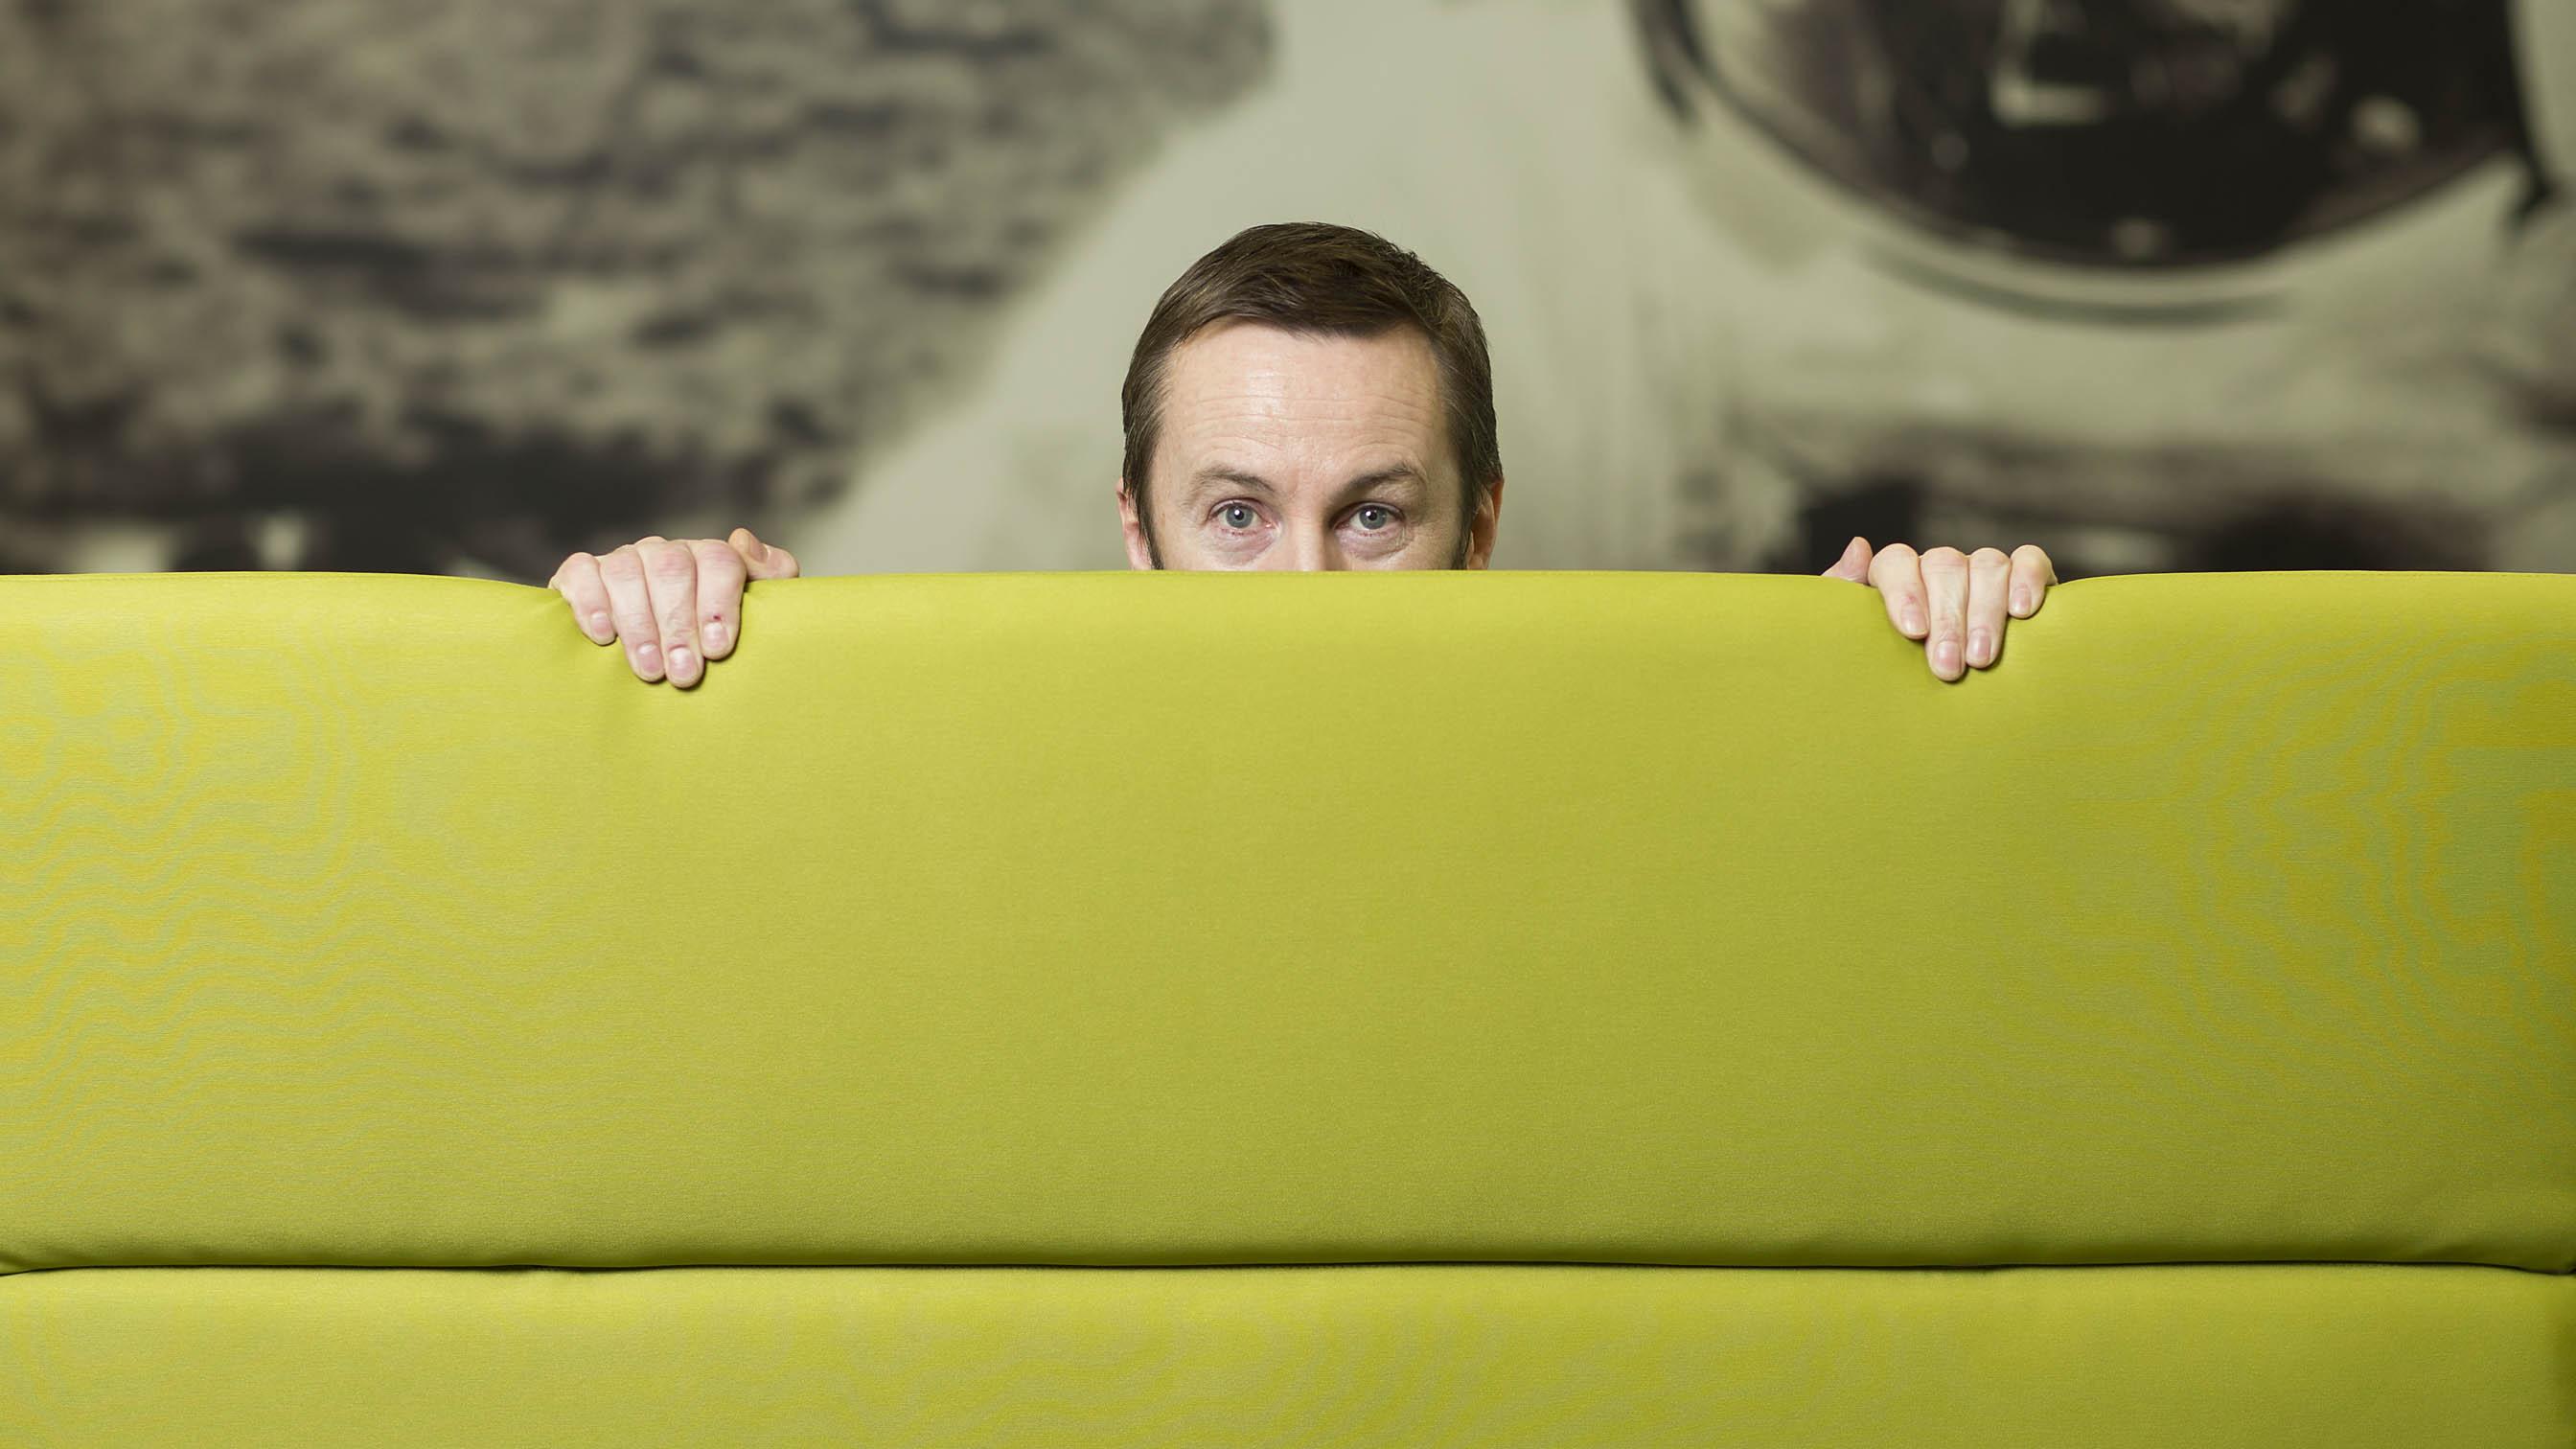 Man stood behind green screen with eyes visible